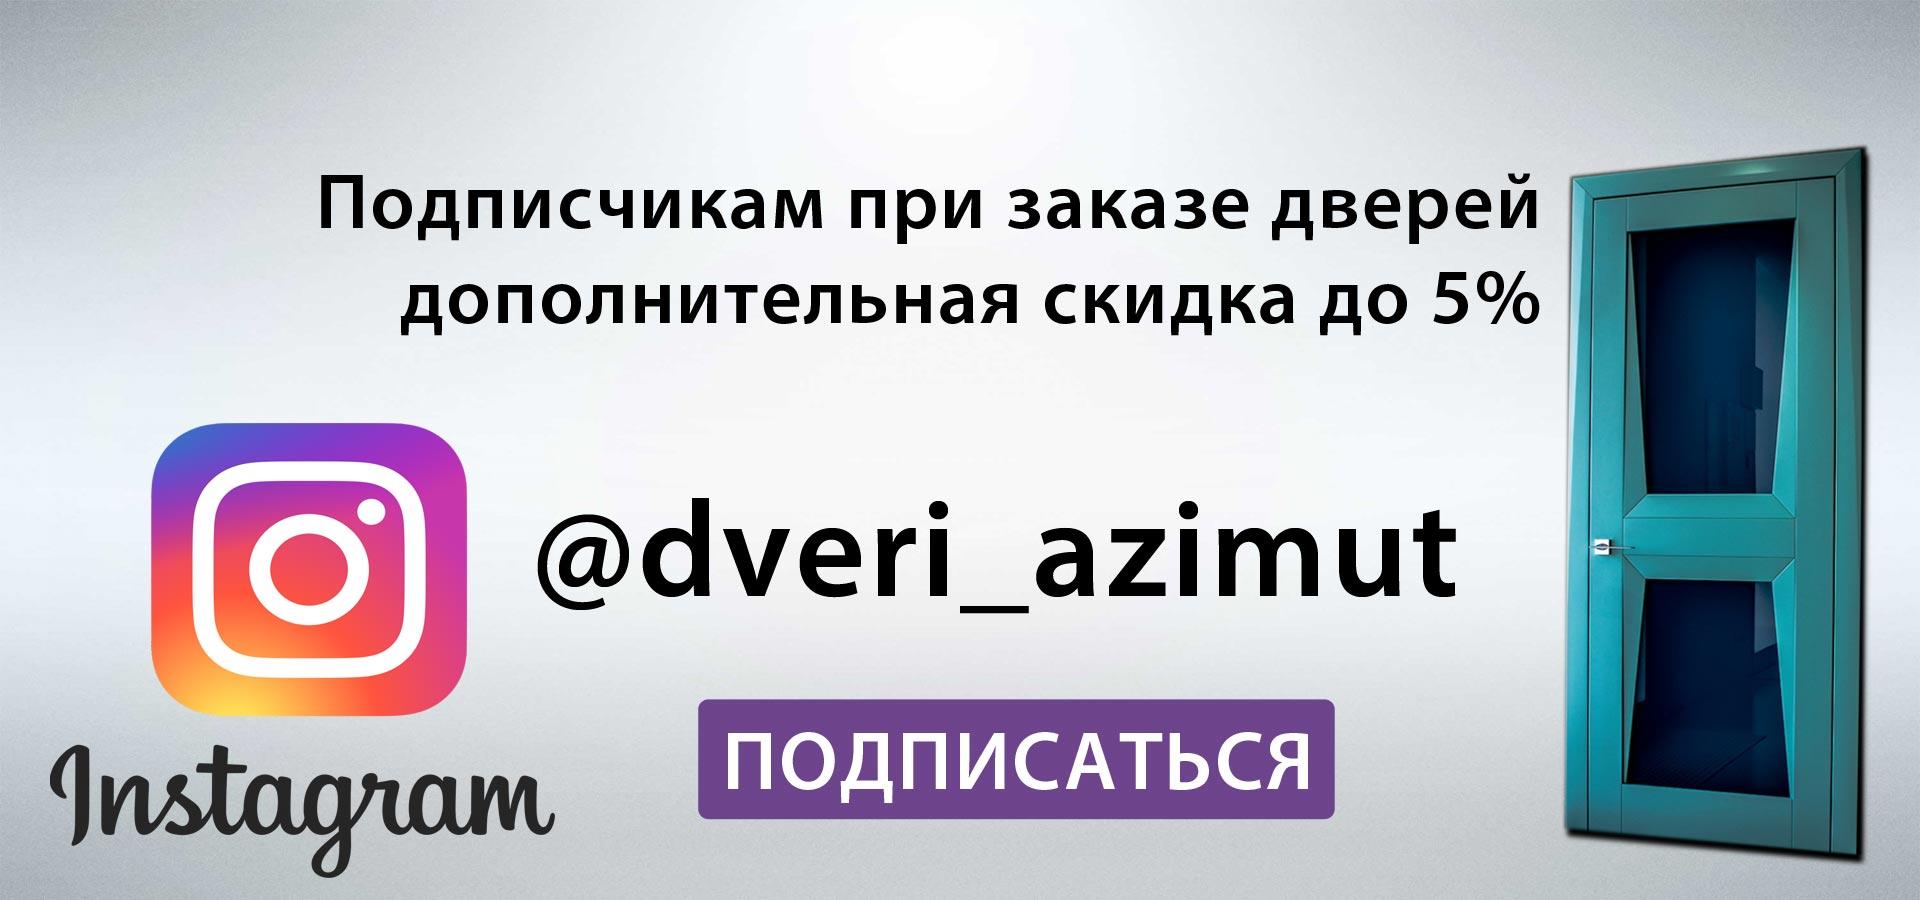 dveri_azimut